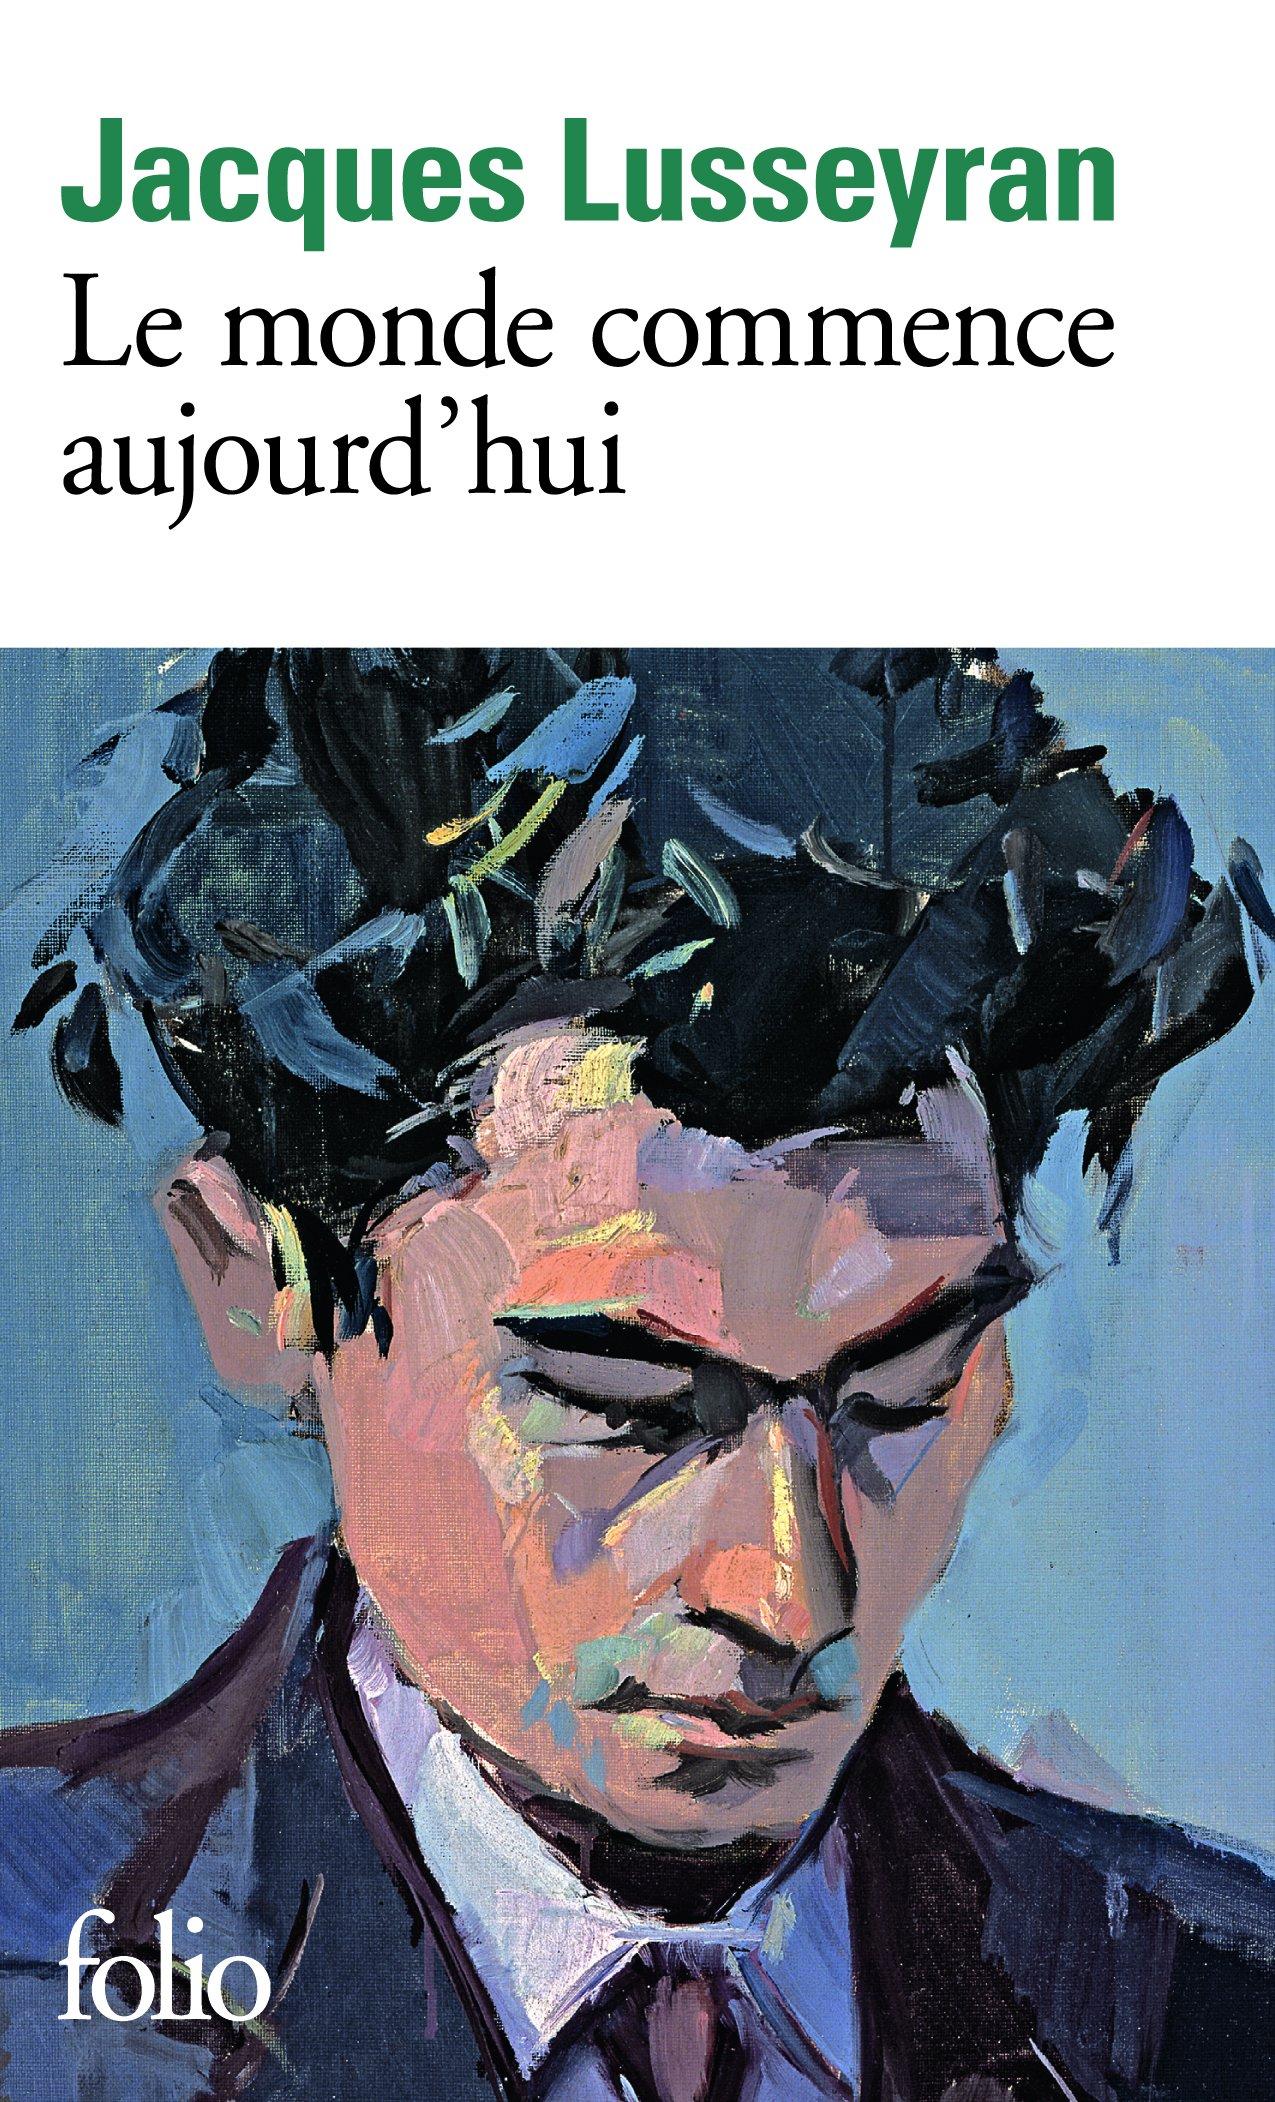 Le monde commence aujourdhui (ARTISAN PHILOSO) (French Edition)